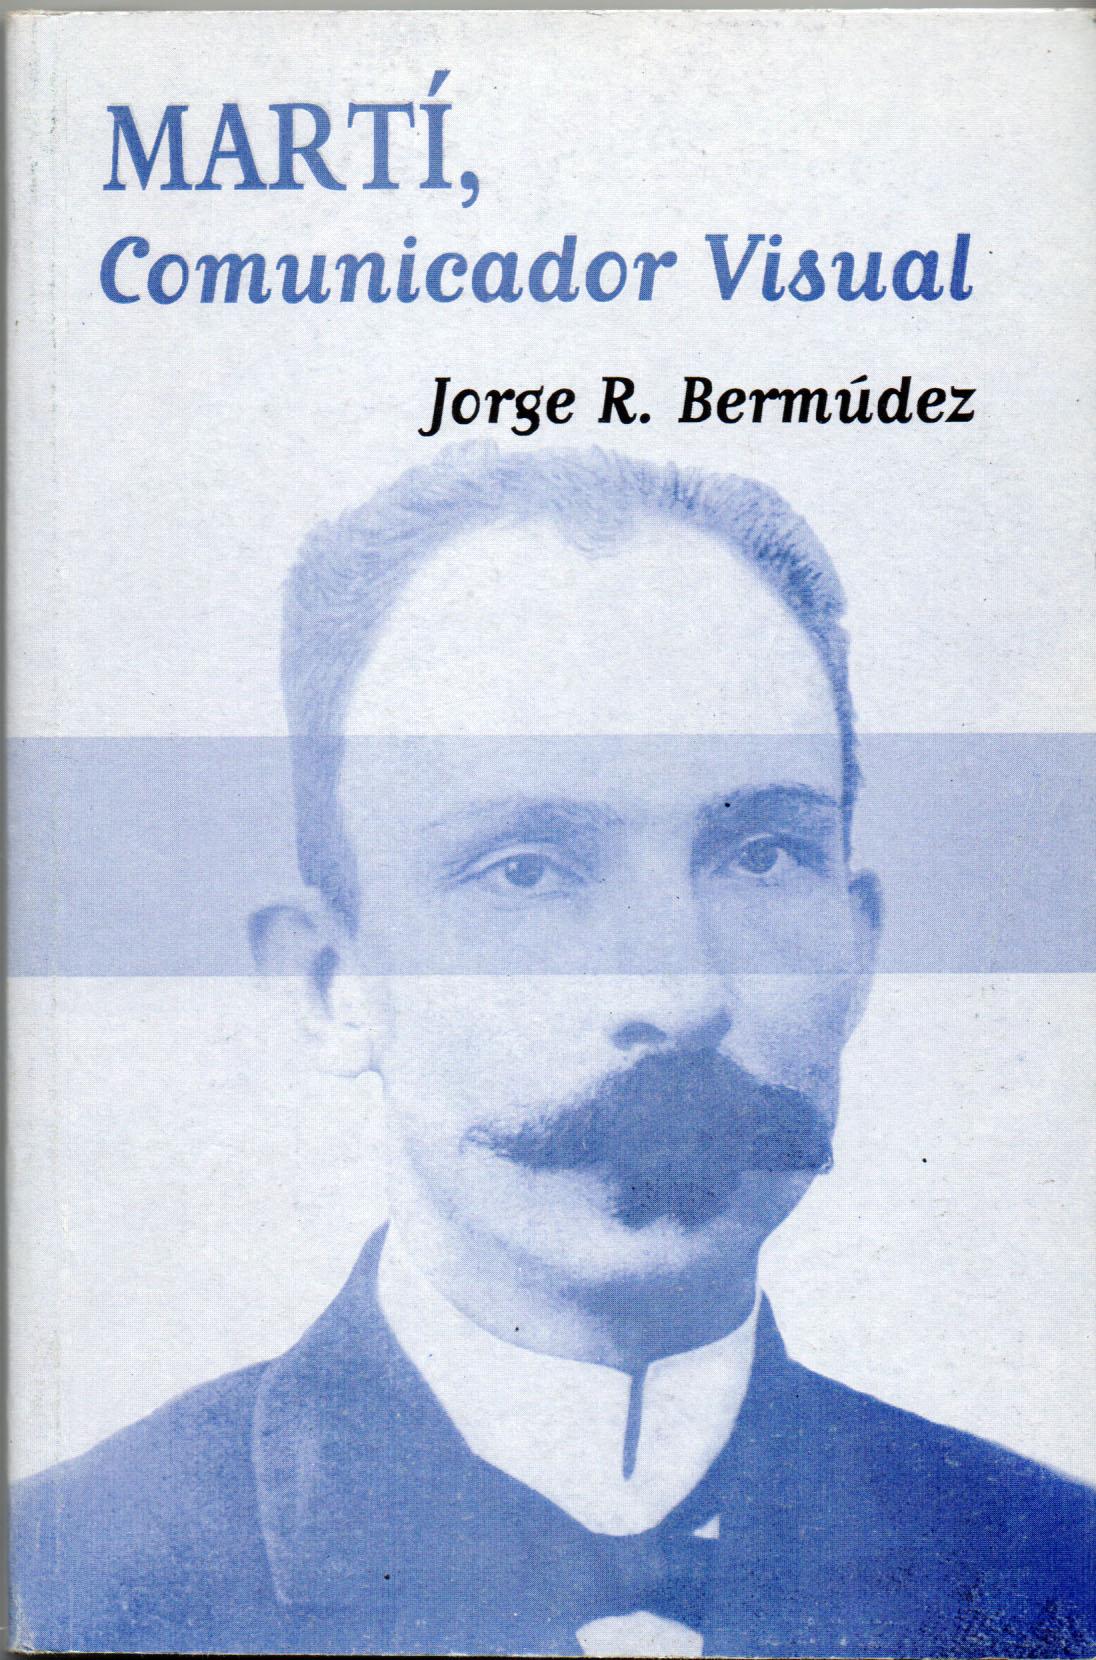 Martí, comunicador visual